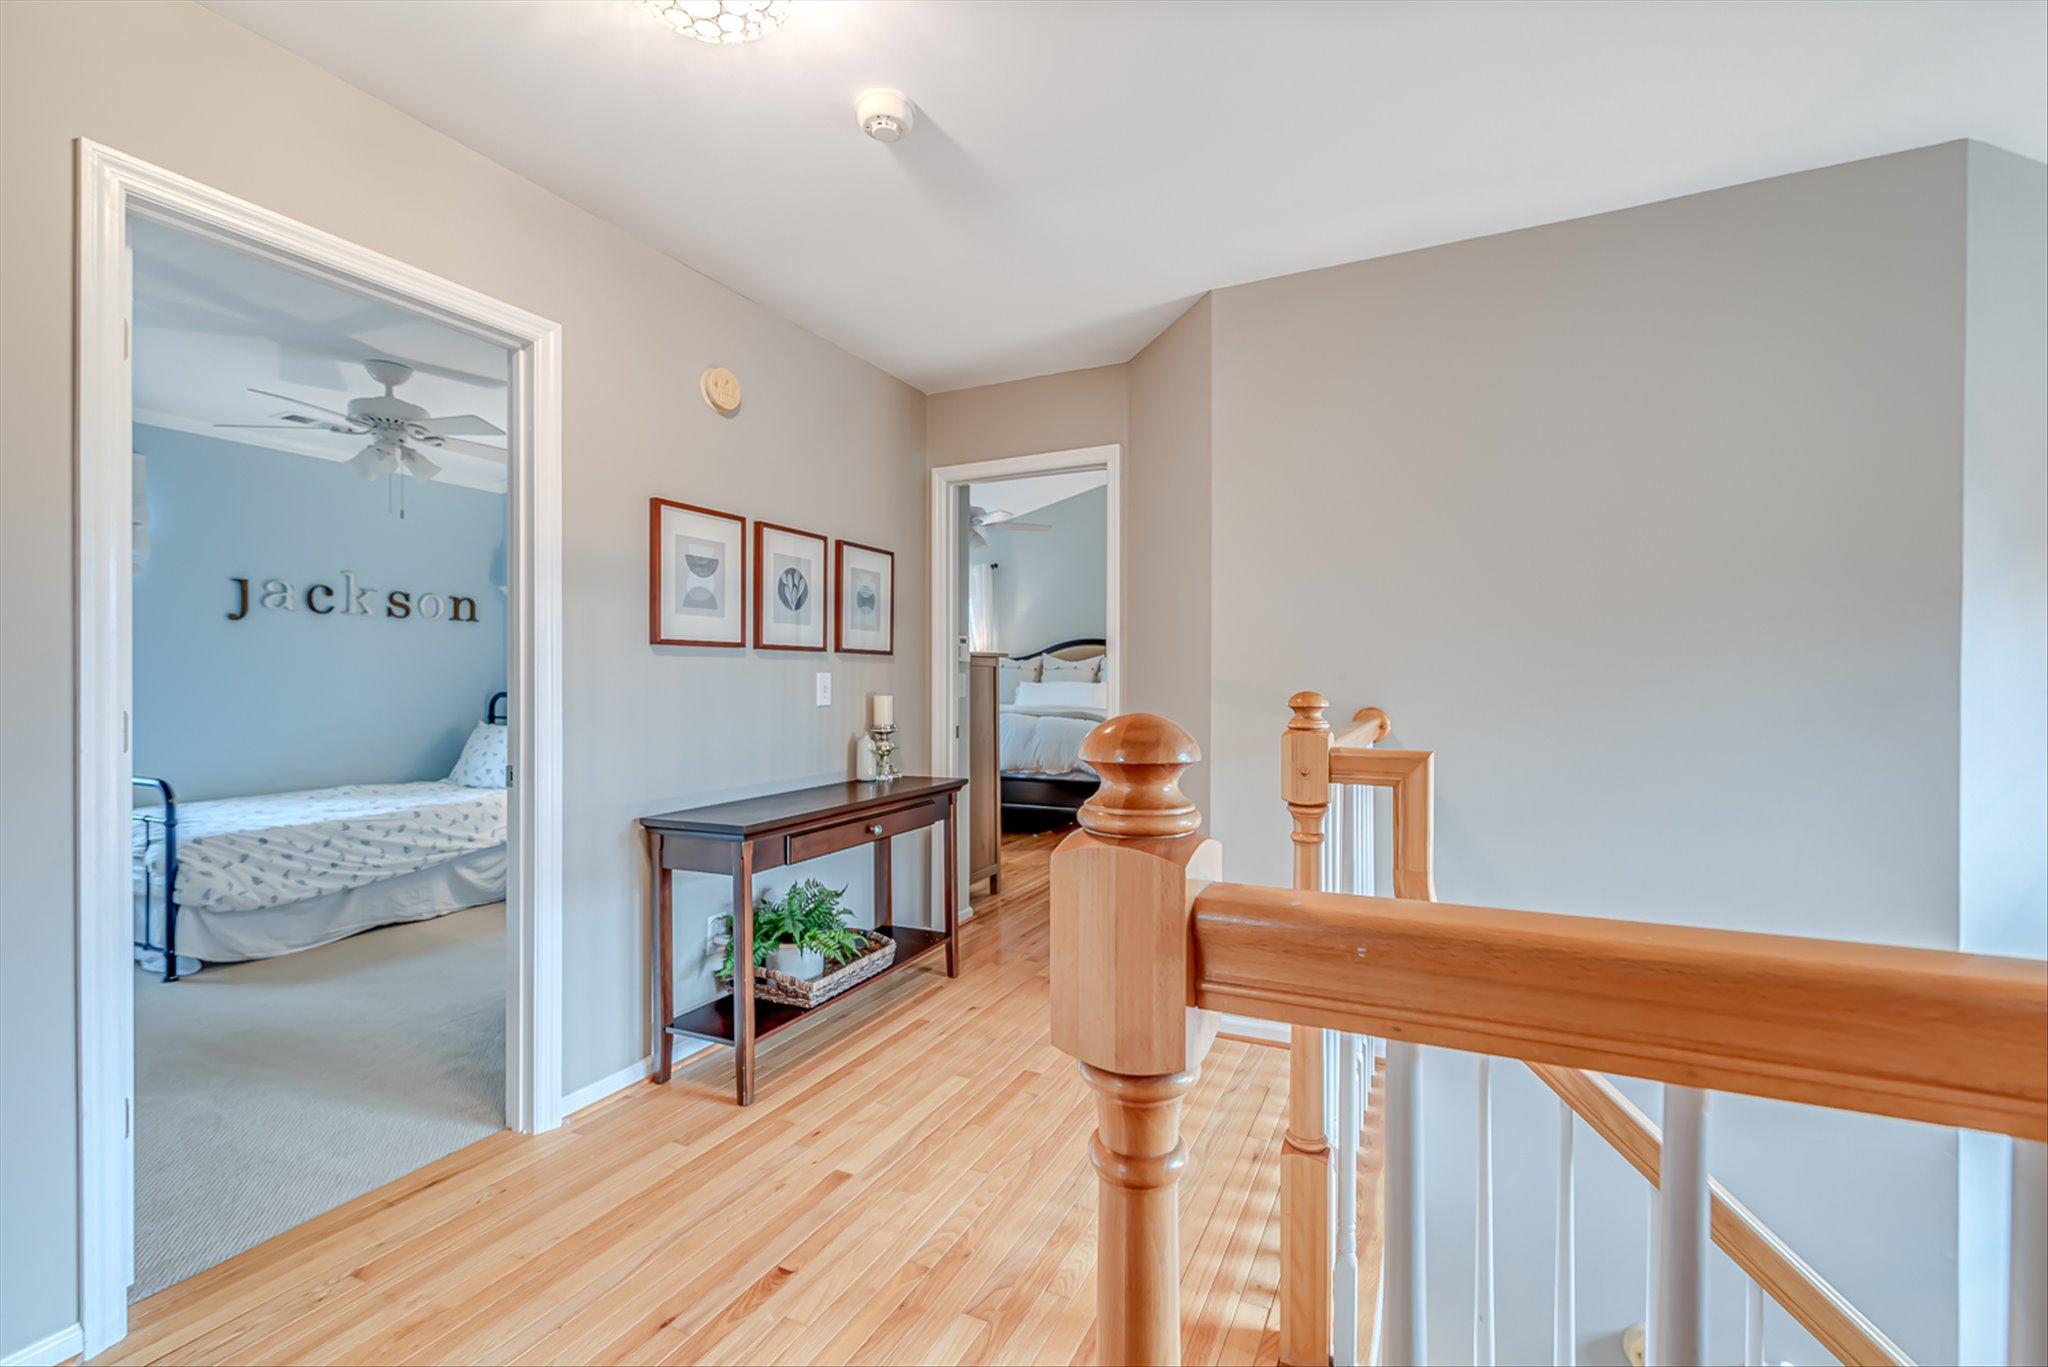 Belle Hall Homes For Sale - 278 Jardinere, Mount Pleasant, SC - 3